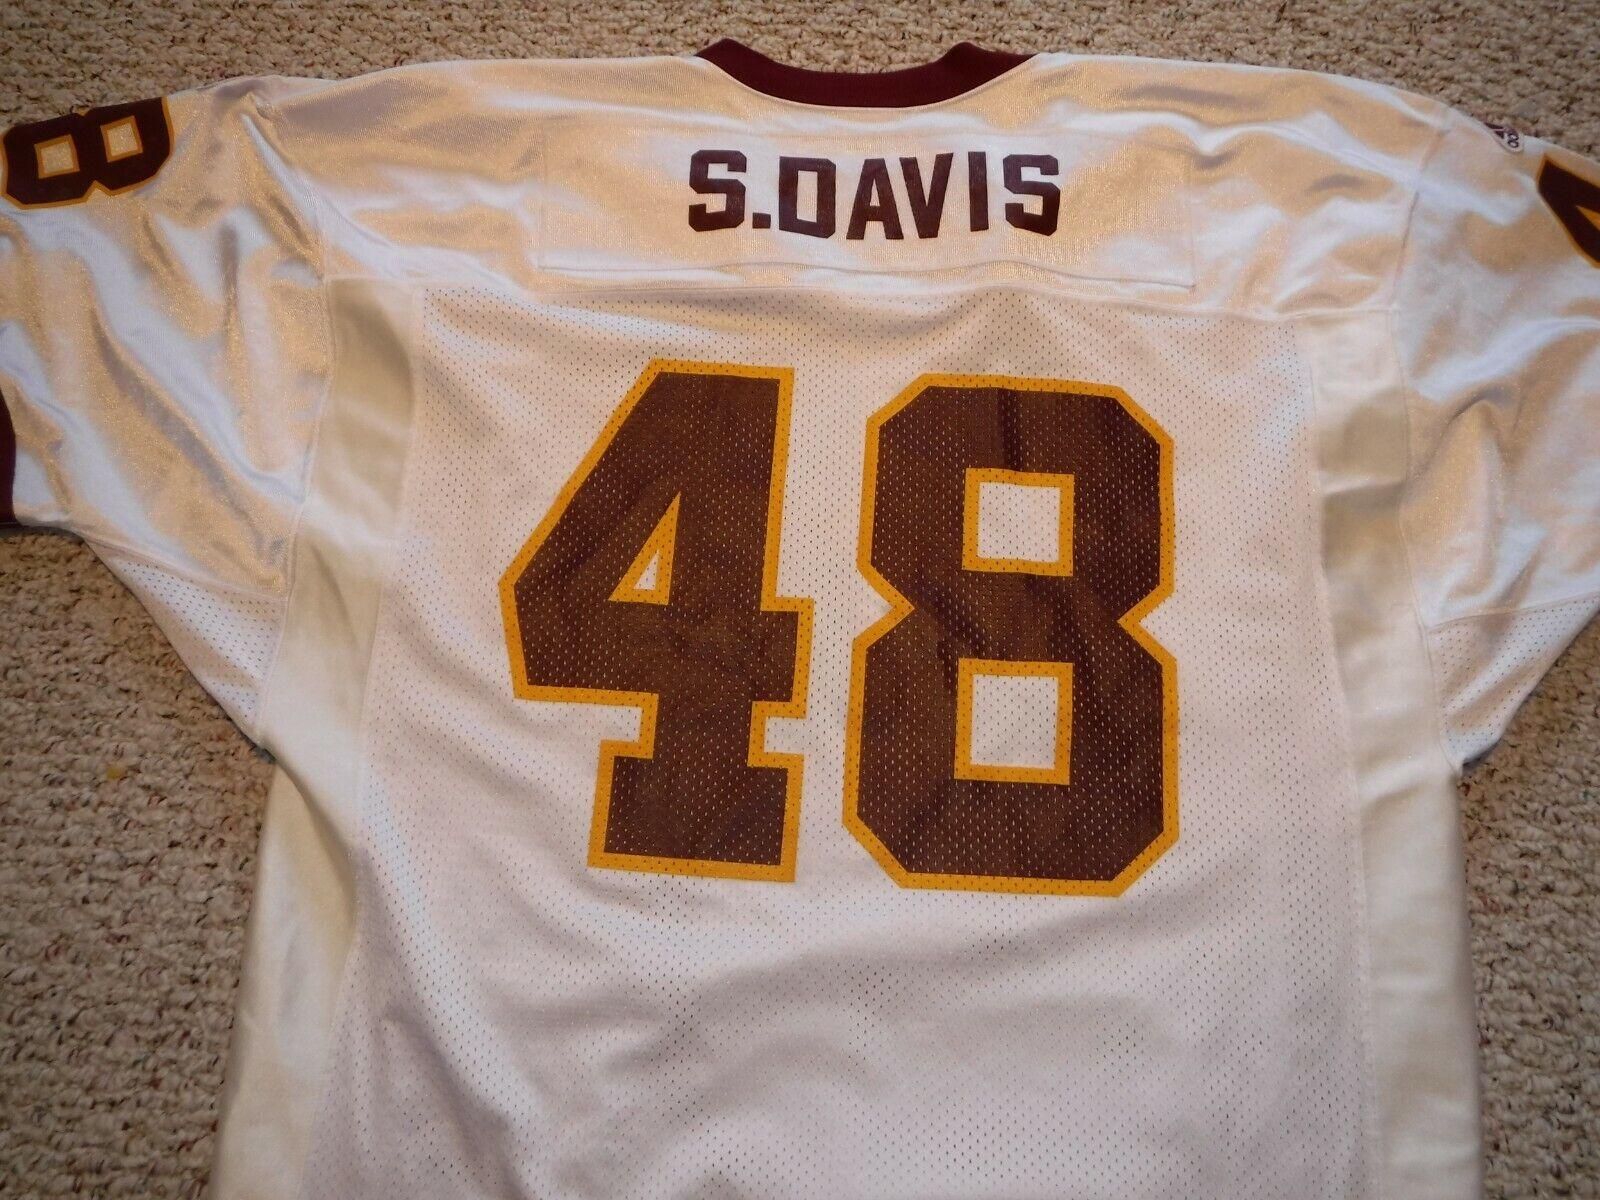 size 52 jersey